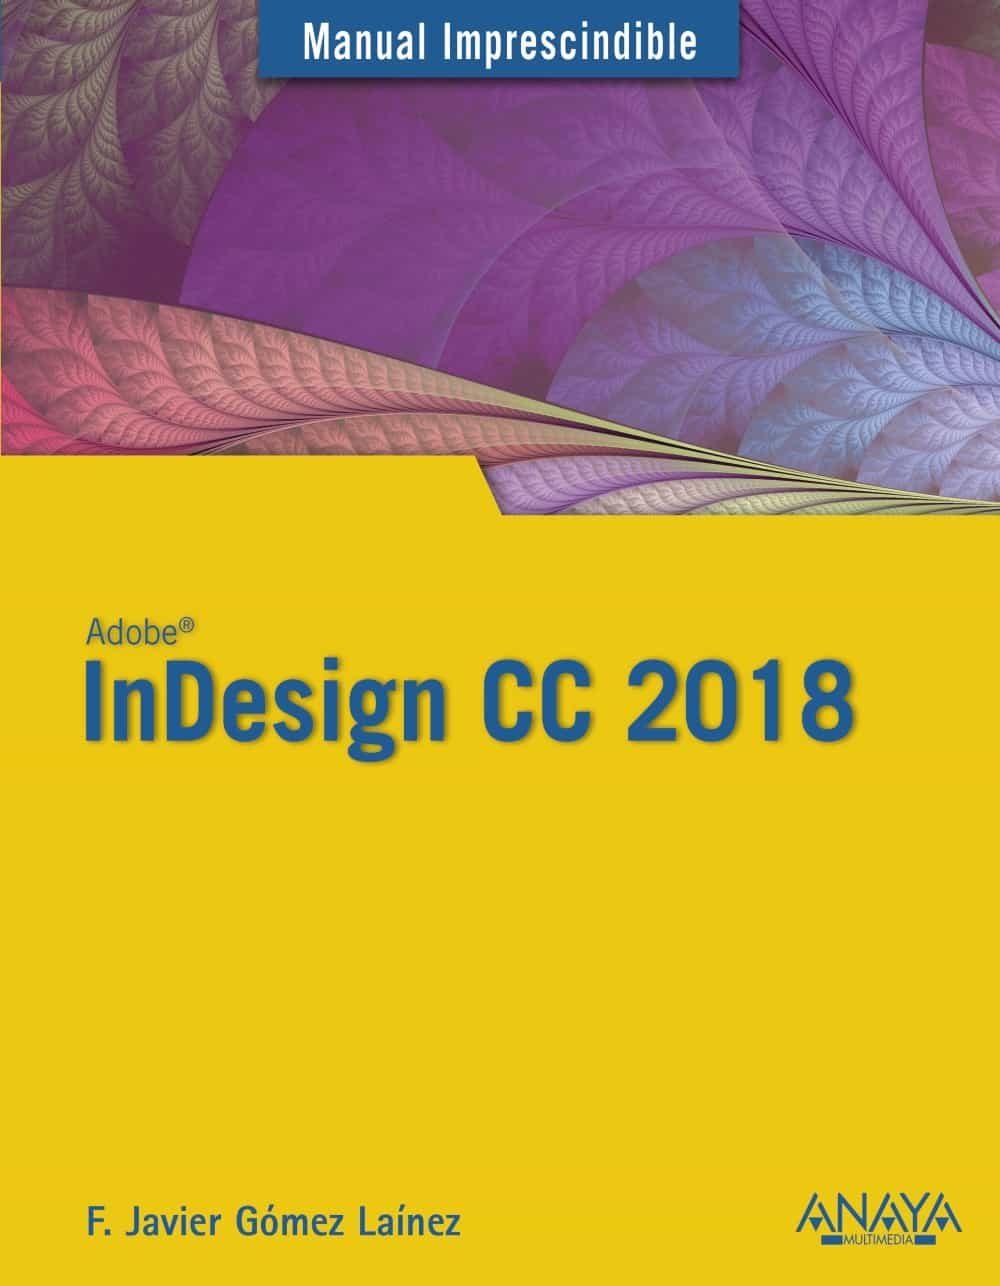 INDESIGN CC 2018 (MANUAL IMPRESCINDIBLE) | F. JAVIER GOMEZ LAINEZ ...